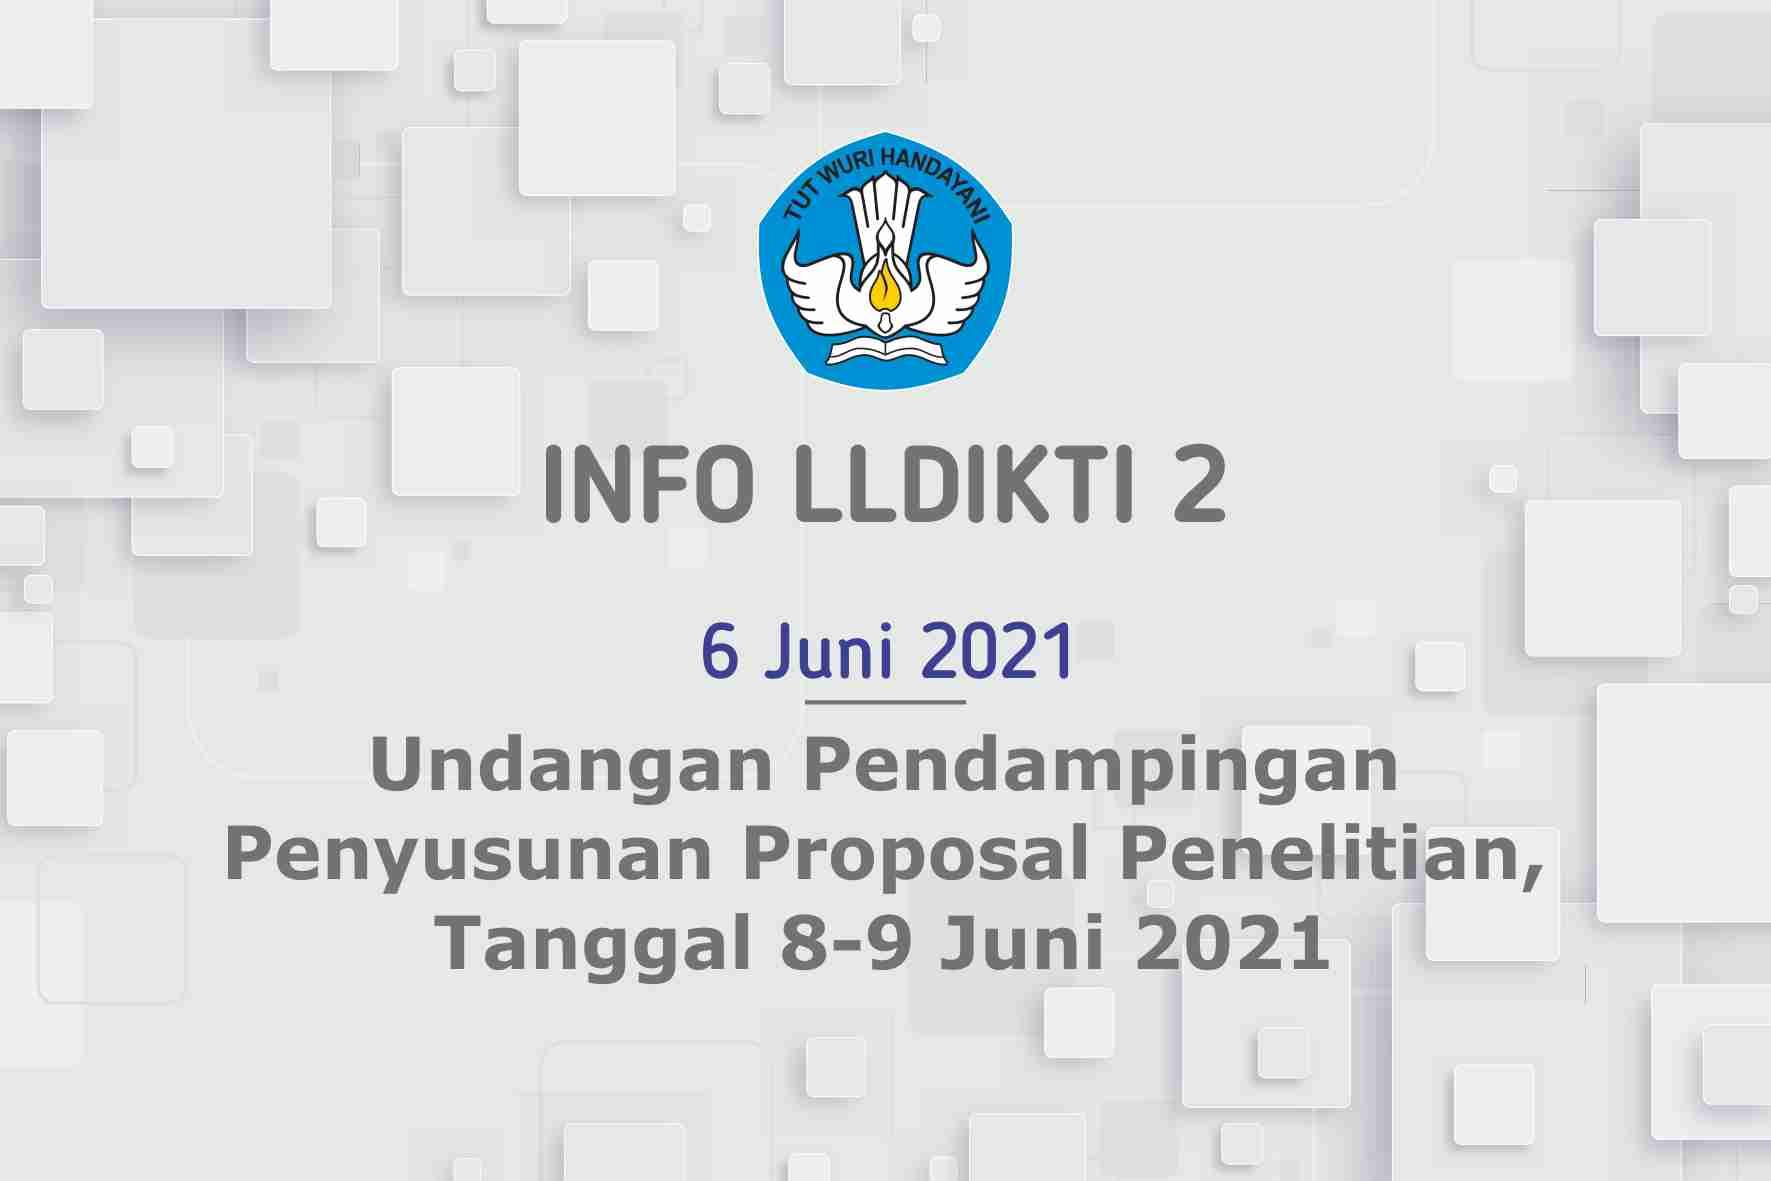 Undangan Pendampingan Penyusunan Proposal Penelitian, Tanggal 8-9 Juni 2021